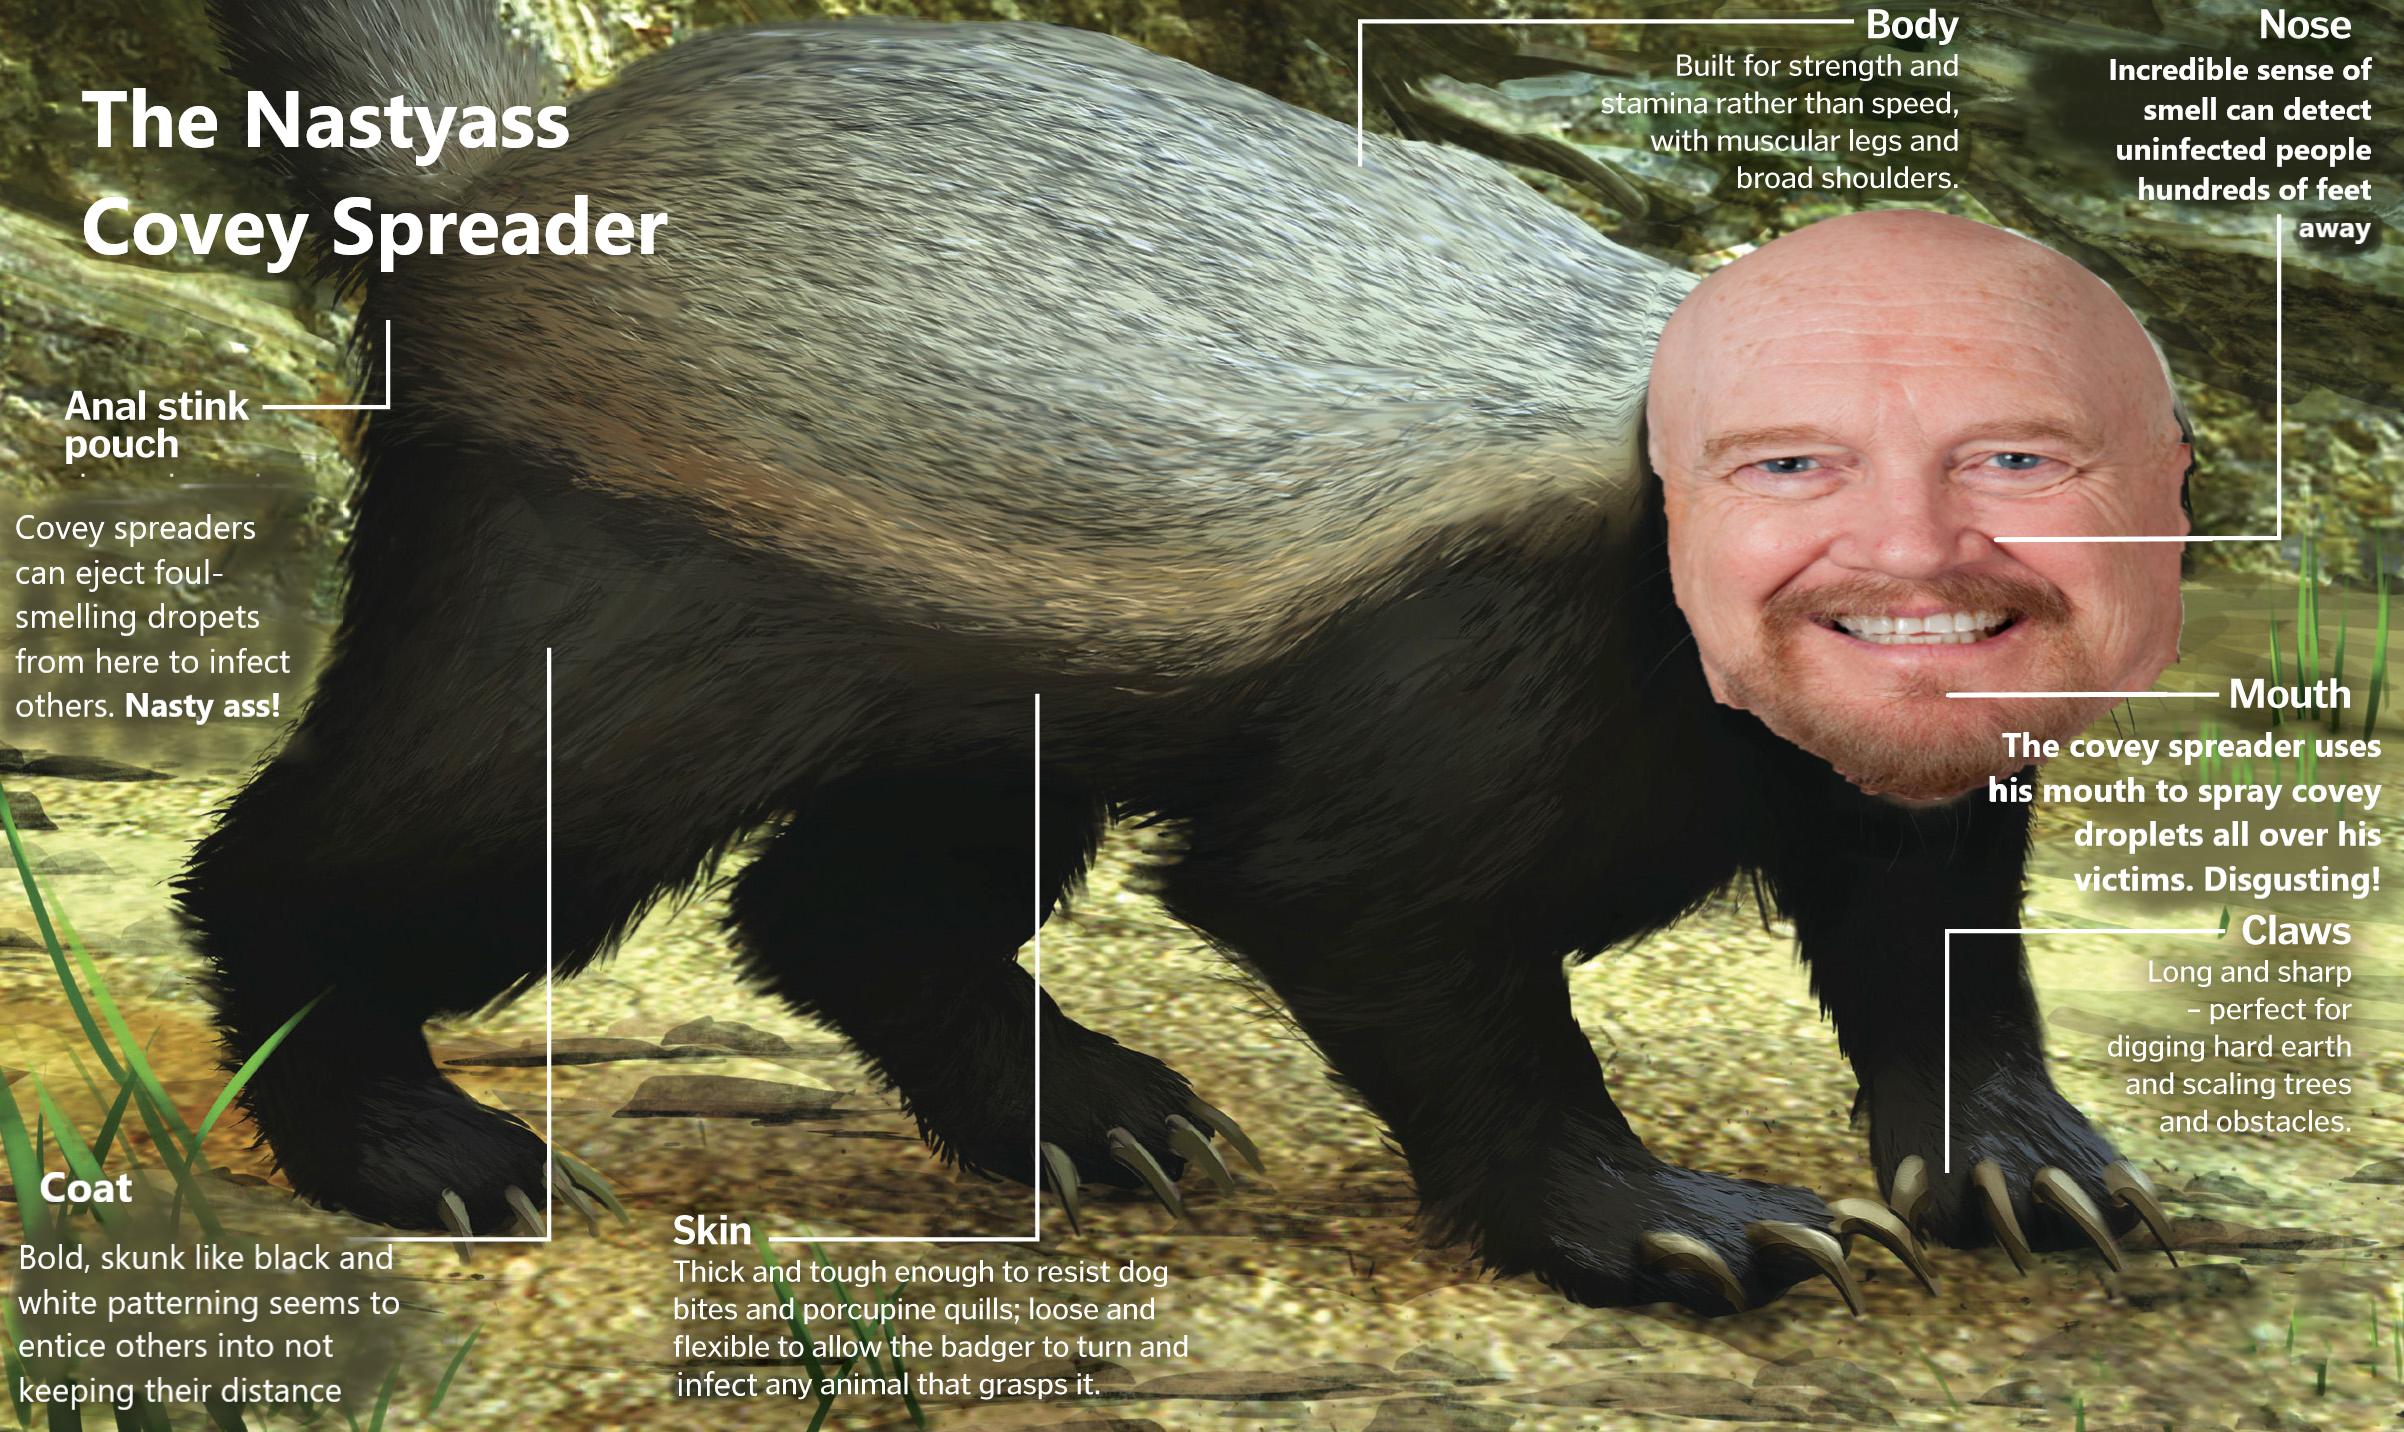 The nasty ass covey spreader extraordinaire: Steve Brandau